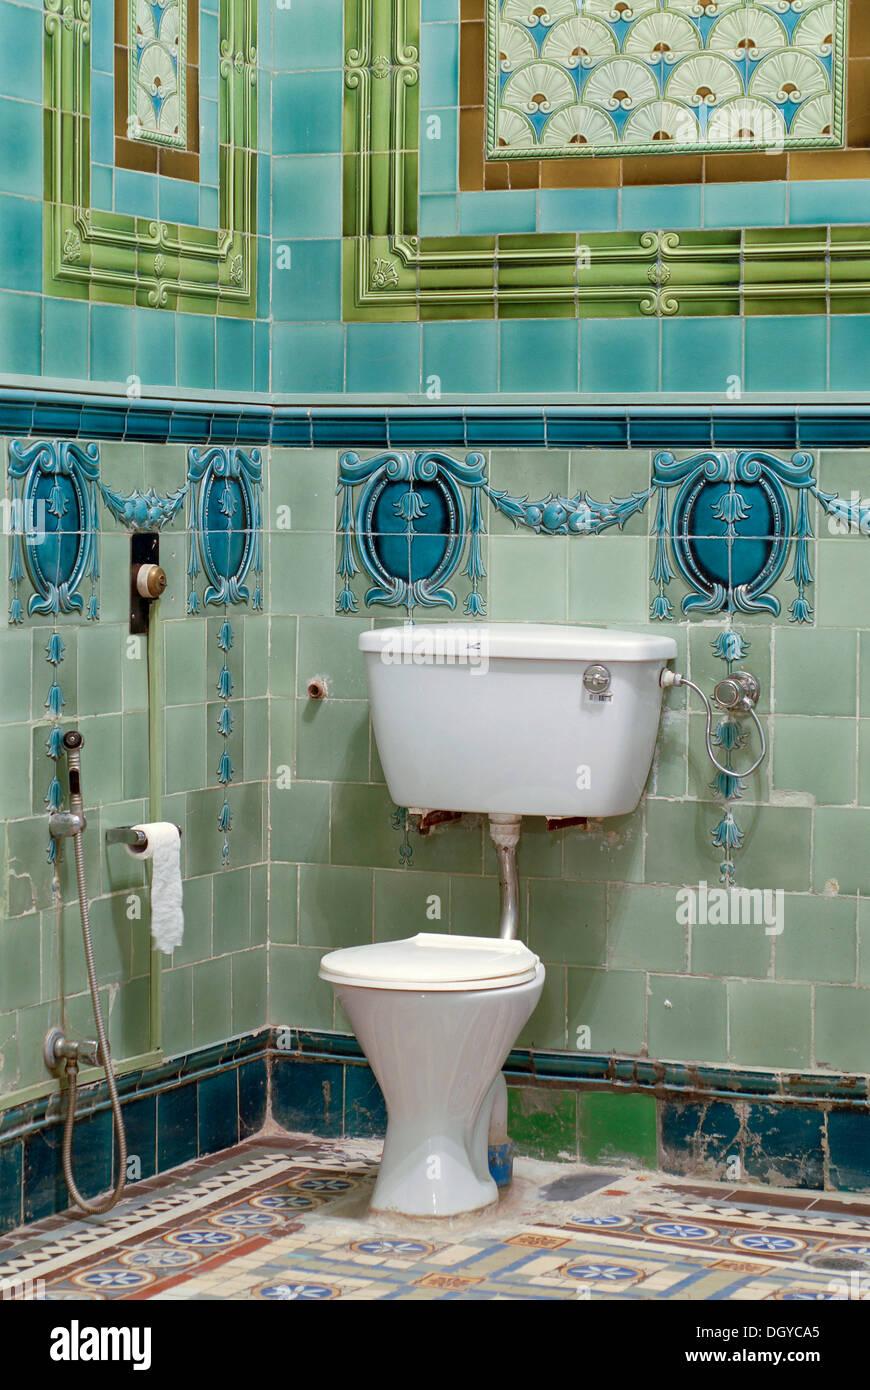 Bathroom tiled with Belgian tiles, Heritage Hotel Raj Niwas Palace ...